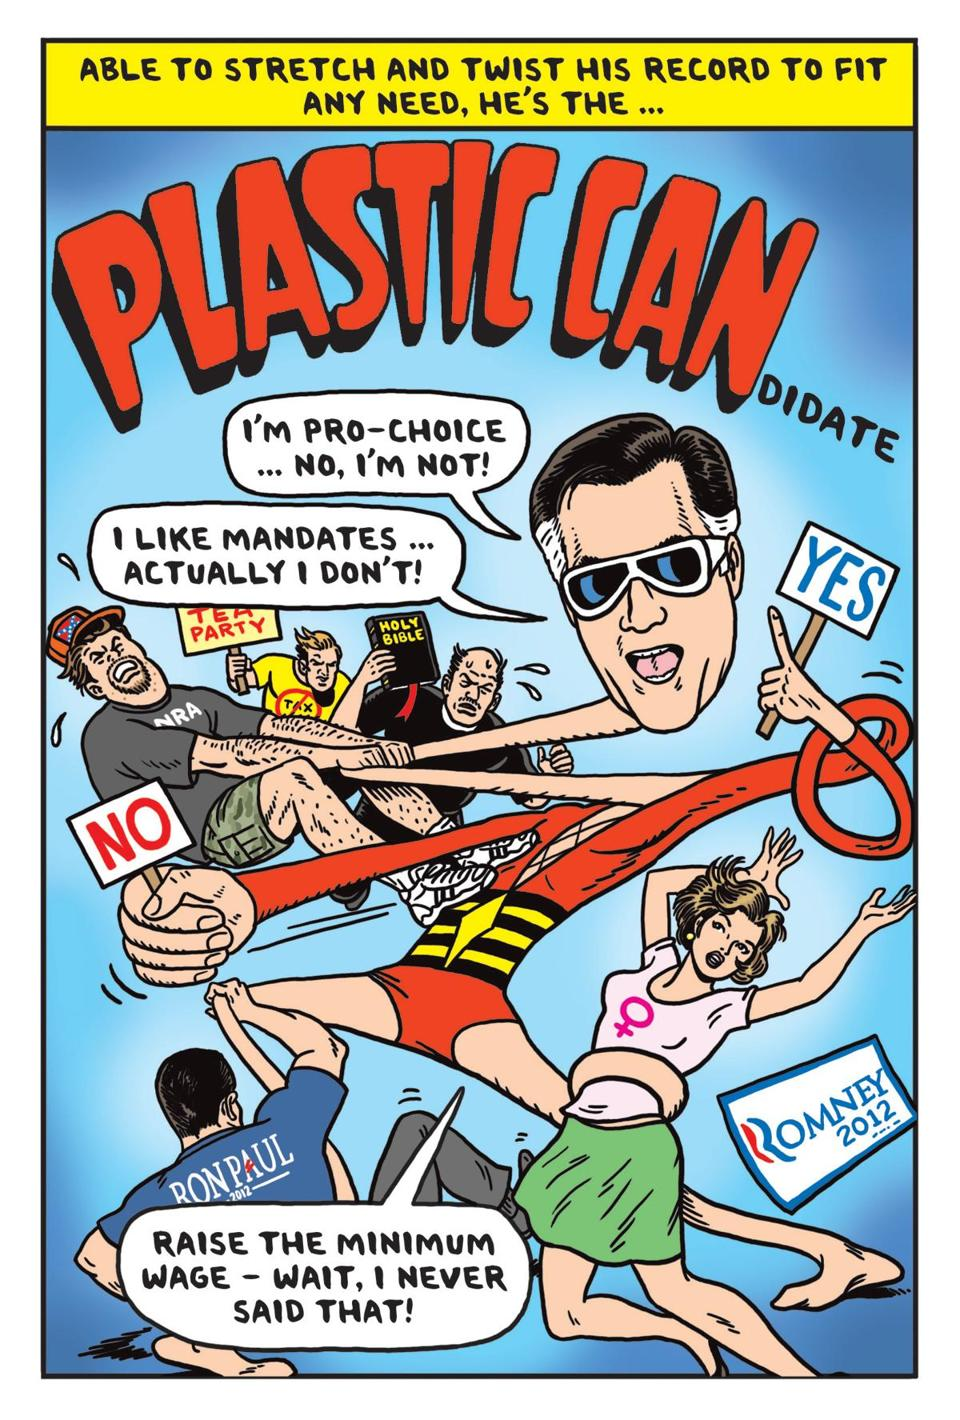 2012-06-26-PlasticCan.jpg